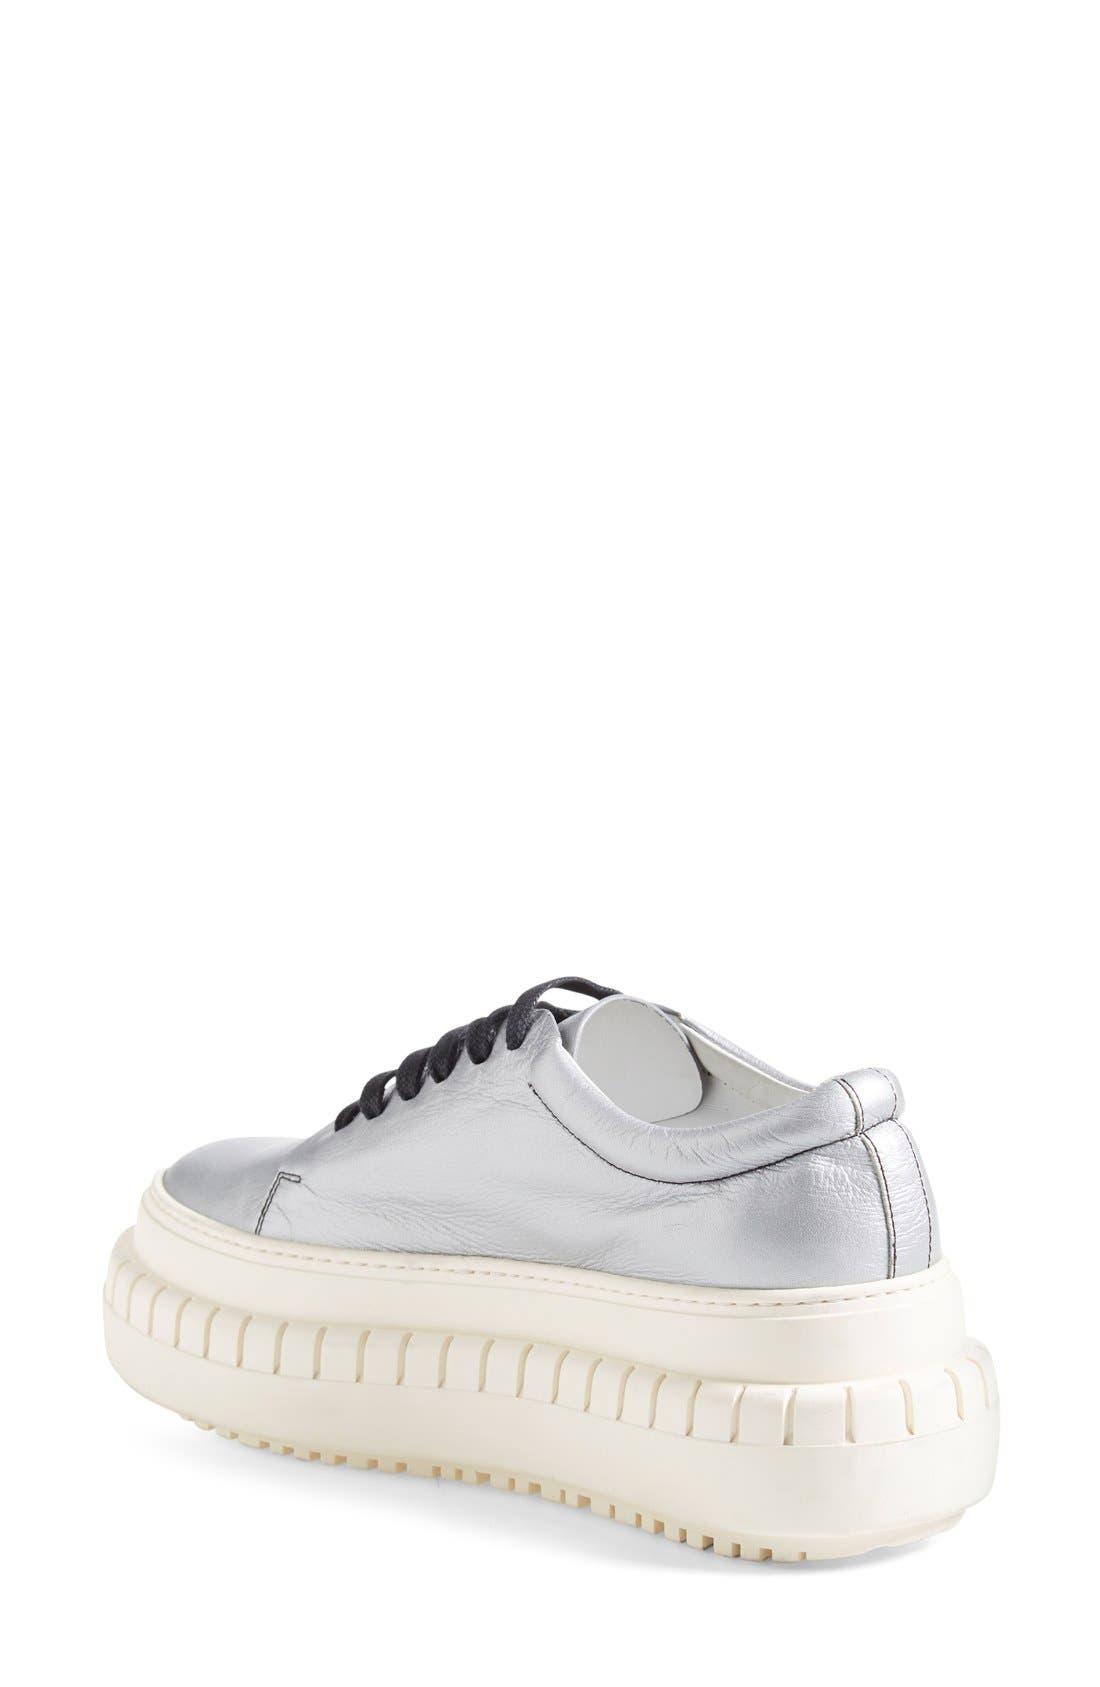 ACNE STUDIOS,                             ACNE Studio 'Saddy' Platform Sneaker,                             Alternate thumbnail 3, color,                             040